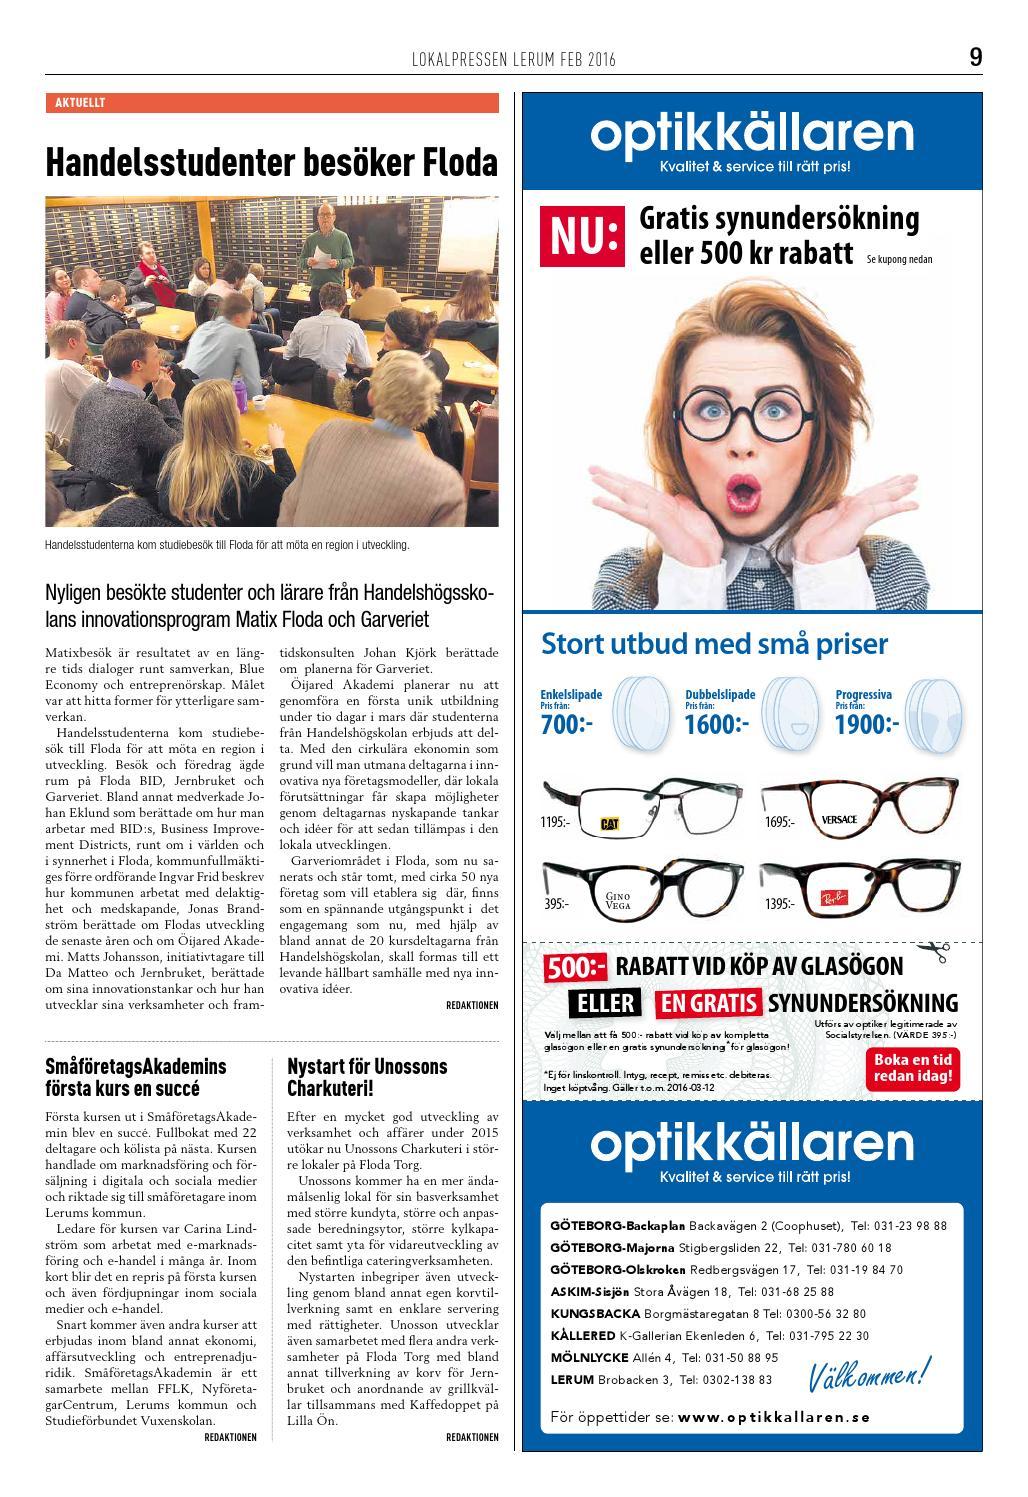 Lokalpressen lerum nr 2 2016 by Lokalpressen - issuu 708d53586af3f